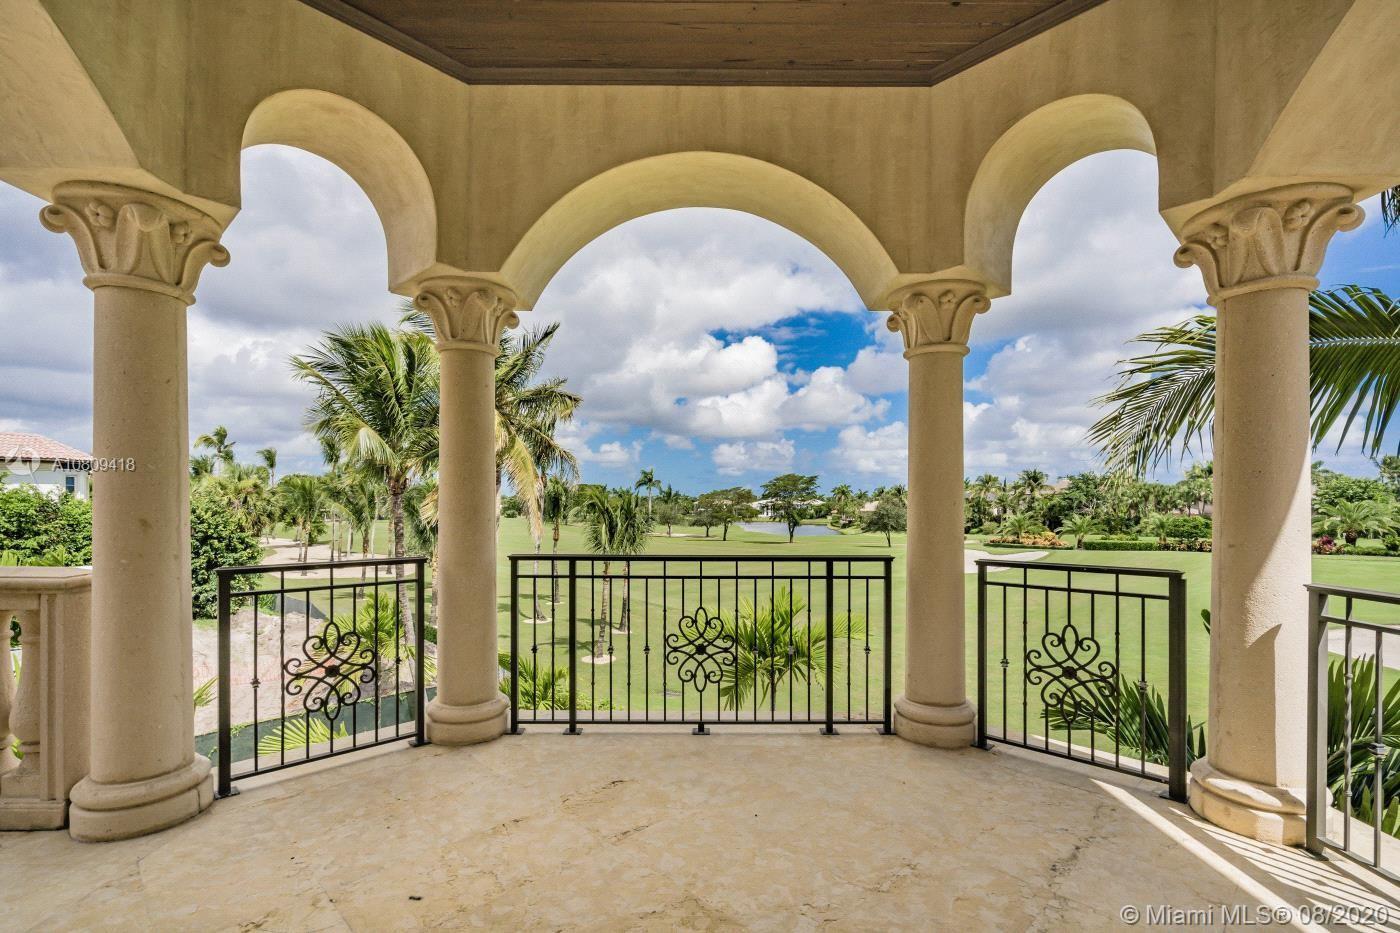 Homes for Sale in Zip Code 33496